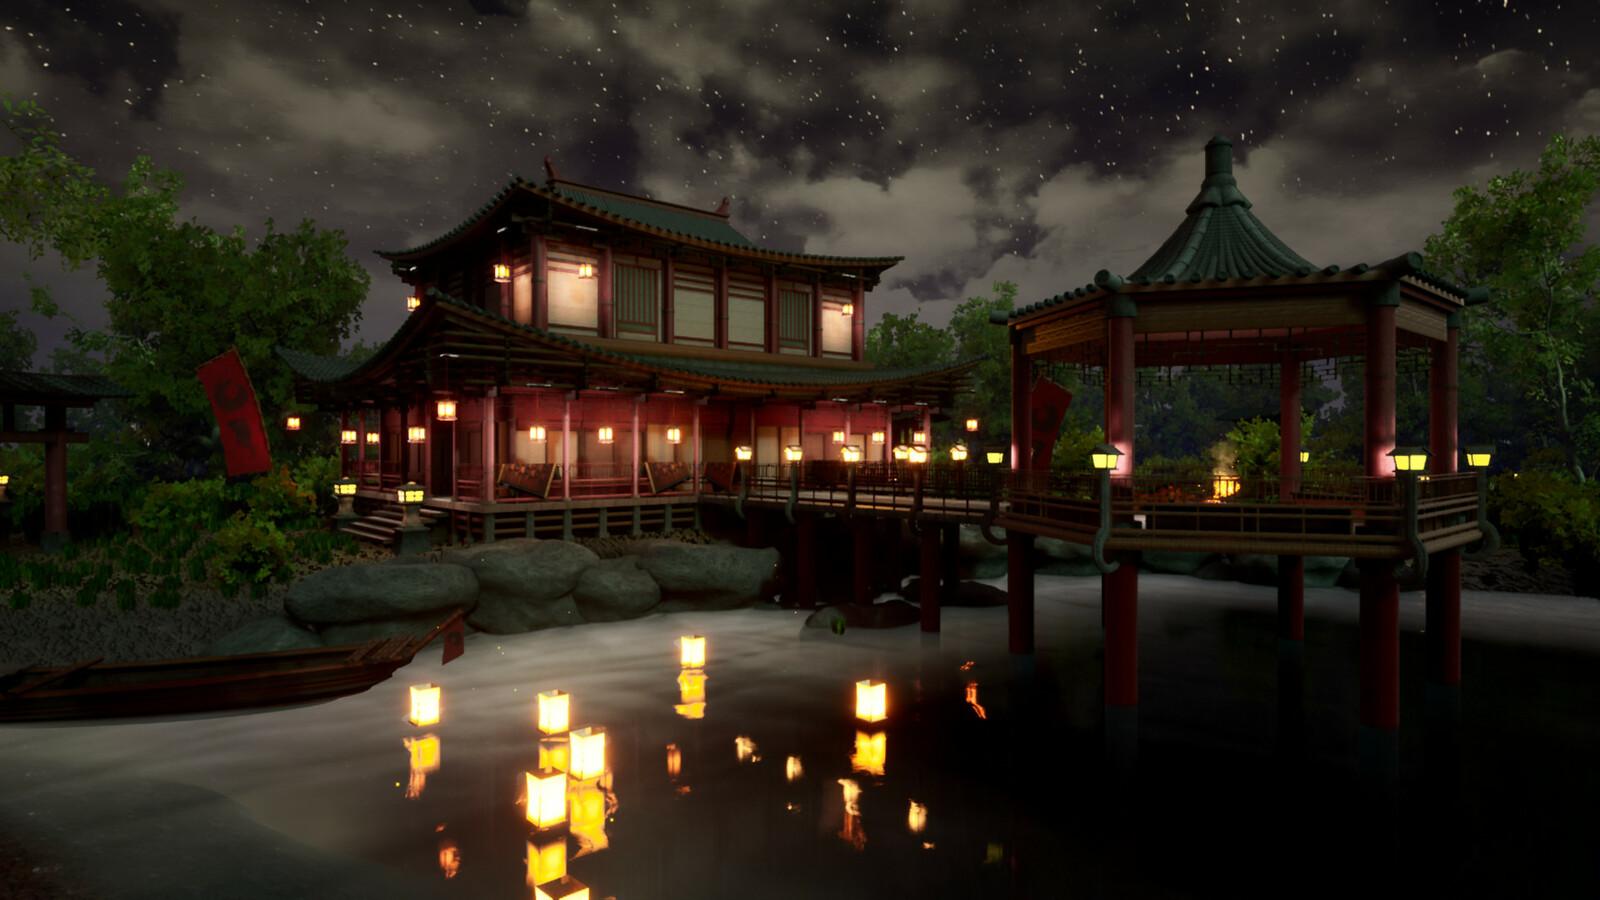 Shogun Temple